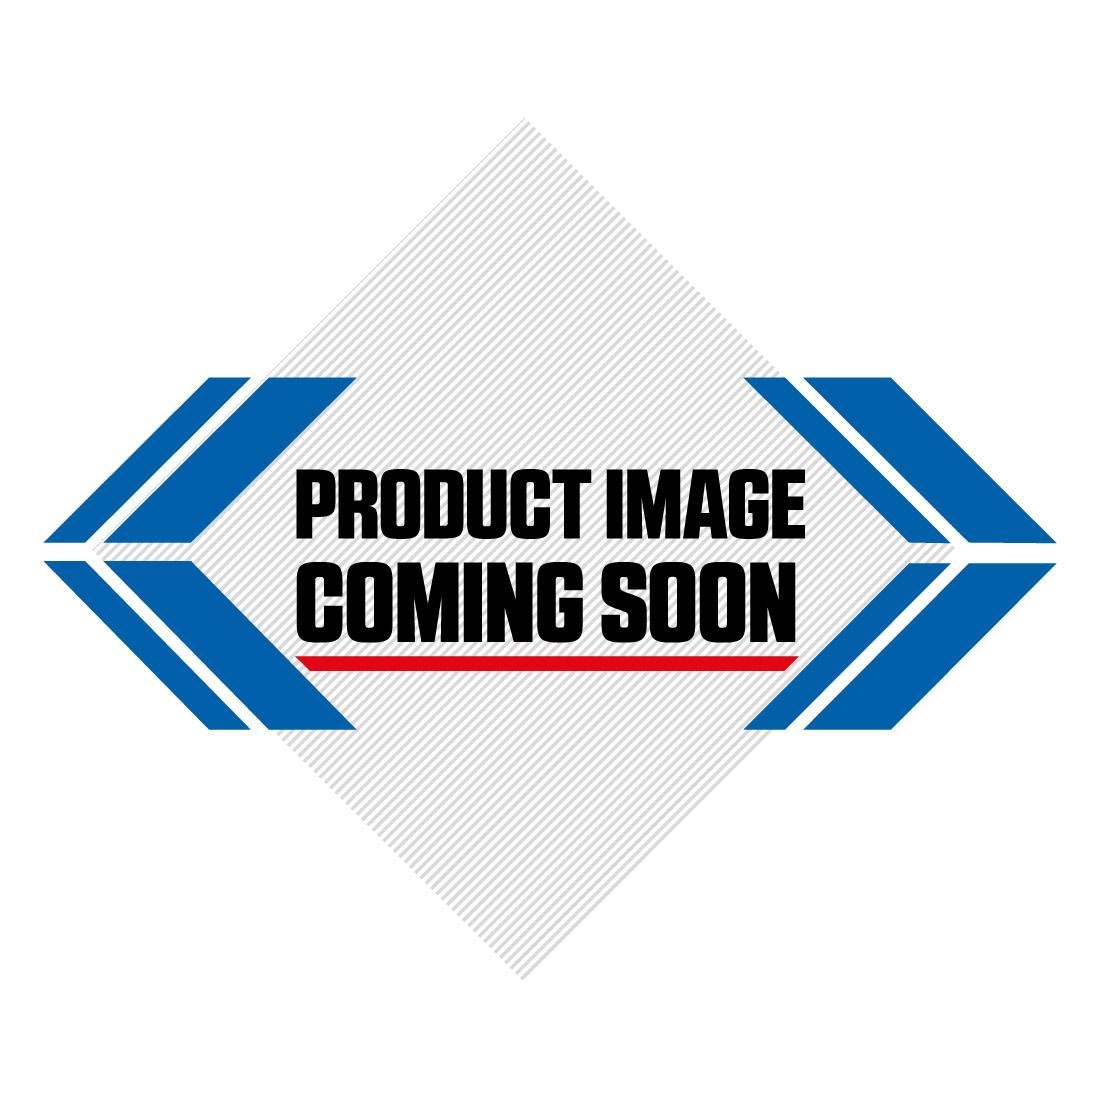 Suzuki Plastic Kit Suzuki RMZ 450 (08-17) White Image-2>